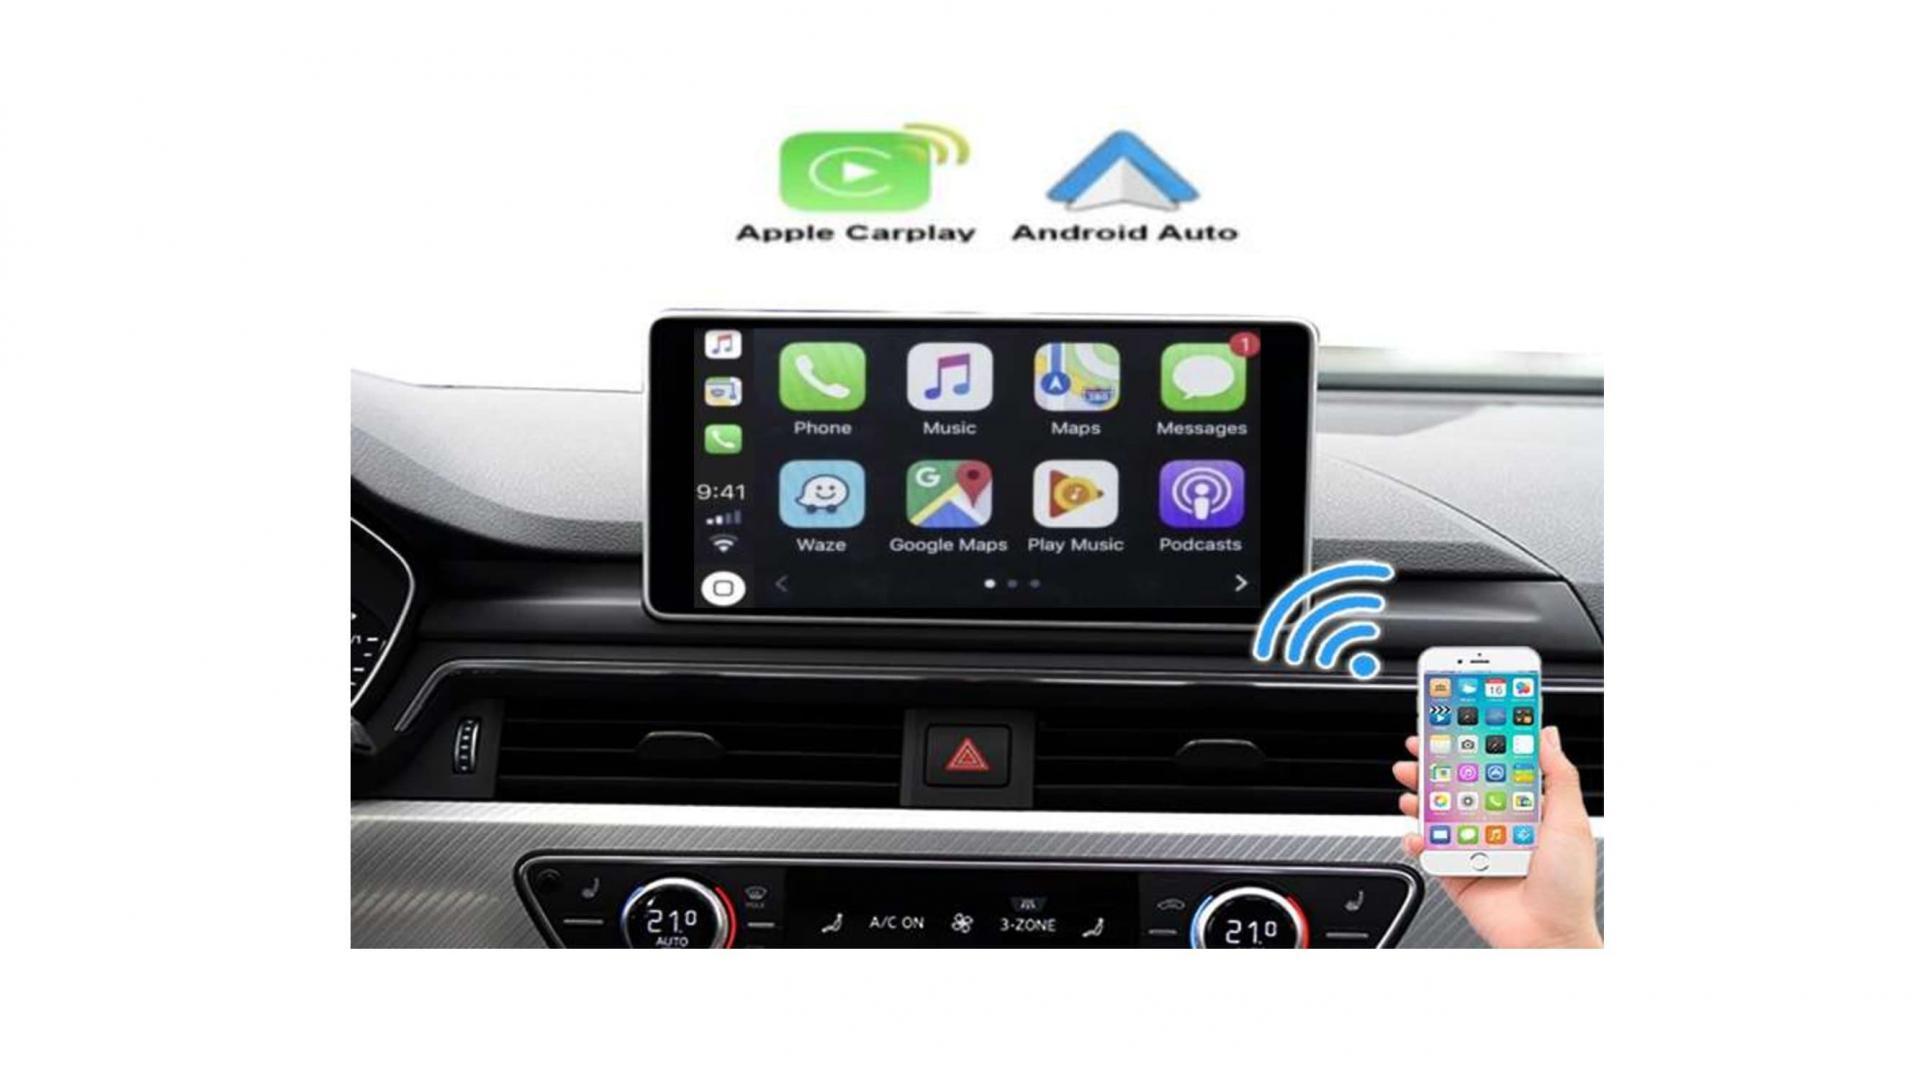 Ford kuga c max explorer f150 transit focus connect tourneo carplay android auto gps autoradio f48 x2 f39 2010 2011 2012 2013 2014 2015 2016 2017 2018 2019 e84 x5 x6 serie 1 serie